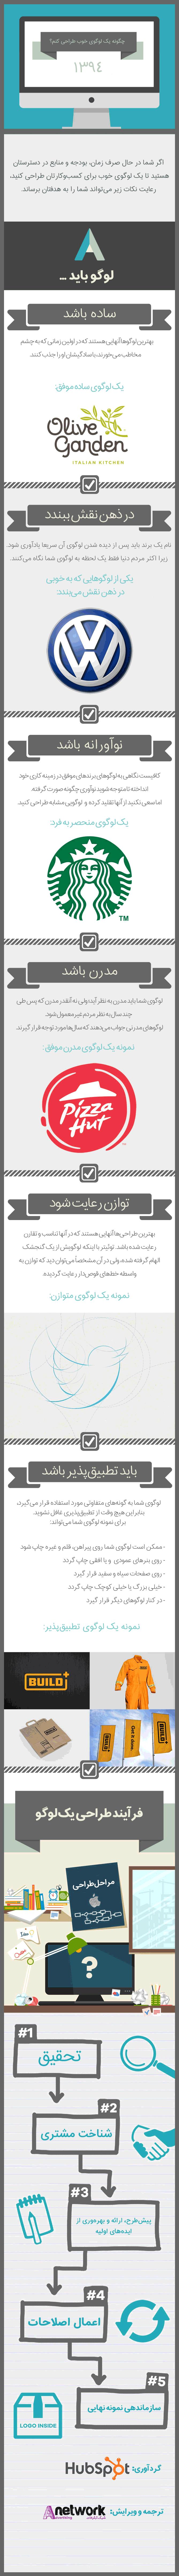 LogoDesign2015-anetwork